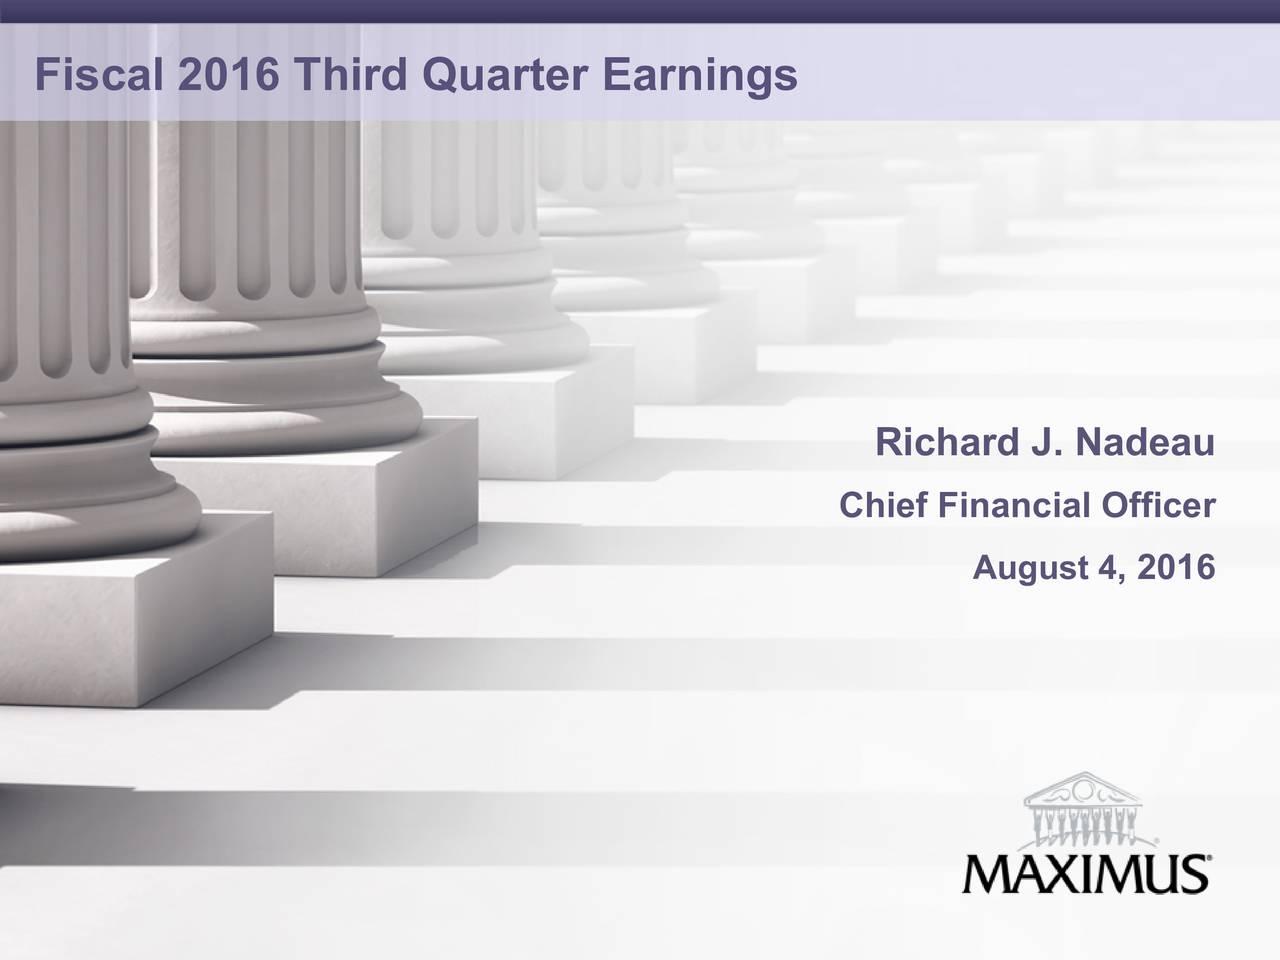 Richard J. Nadeau Chief Financial Officer August 4, 2016